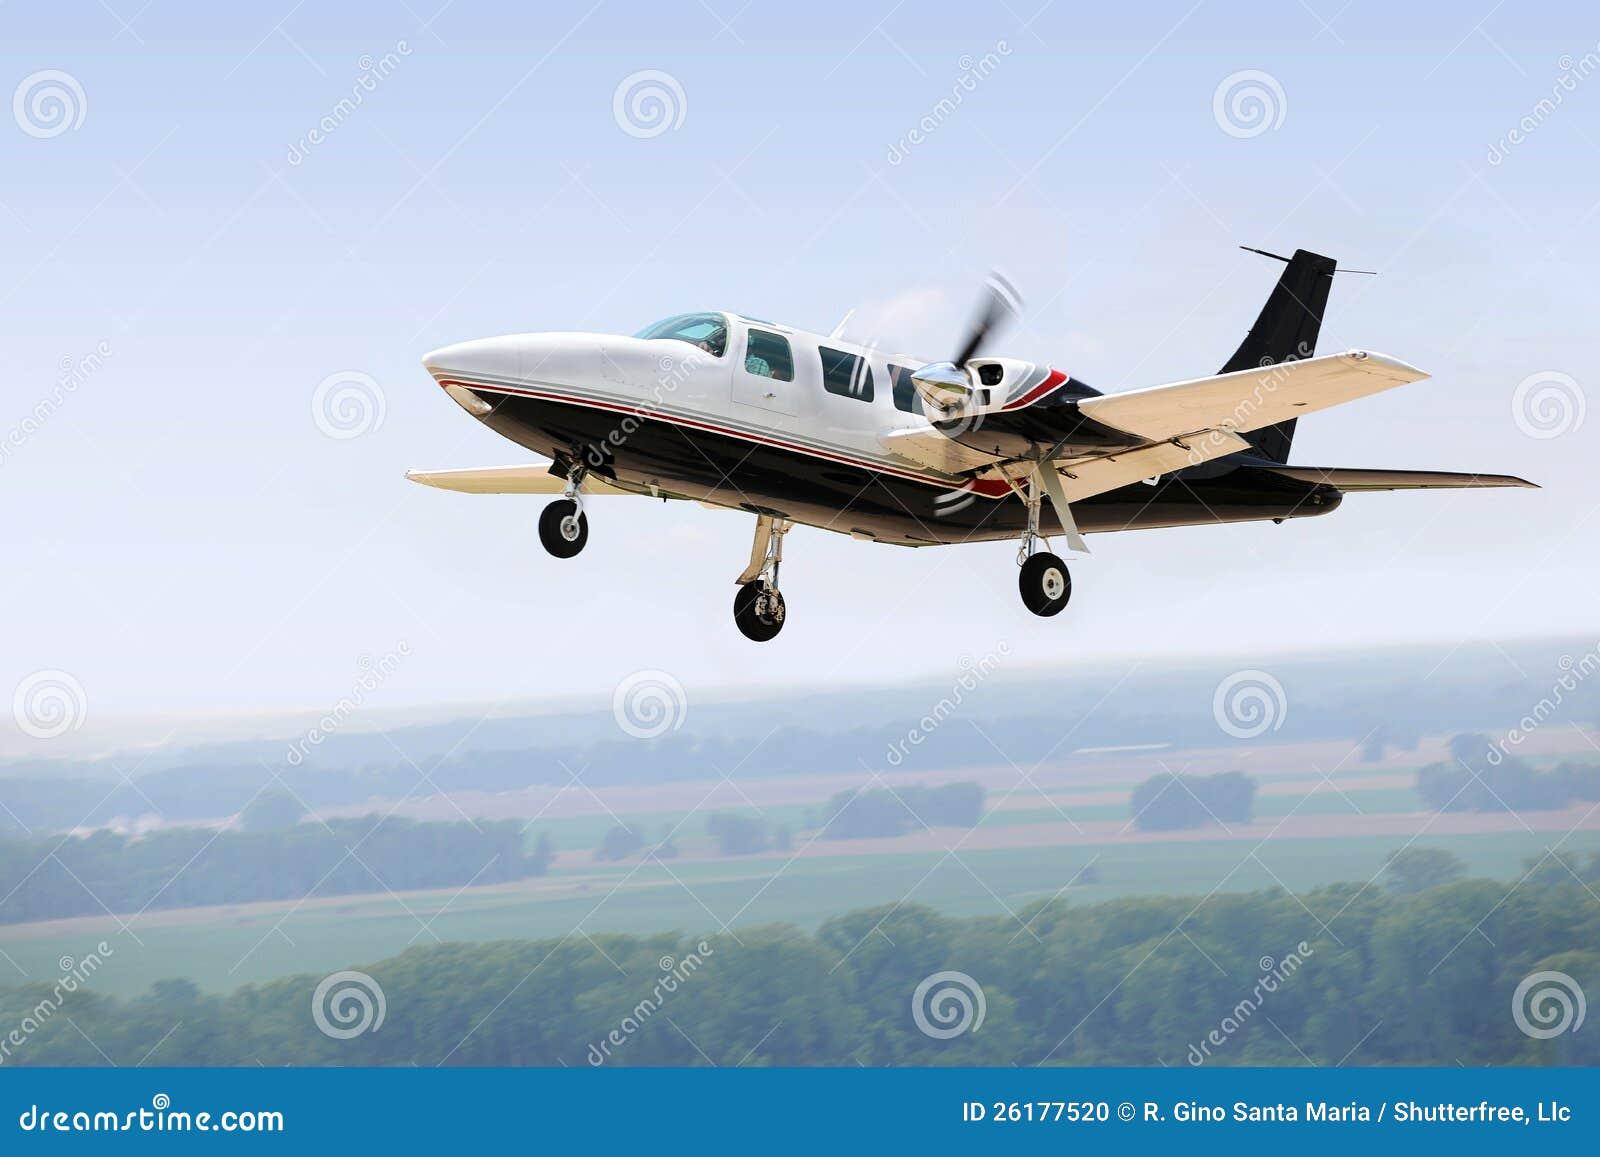 Airplane Landing Or Taking Off Stock Photo - Image: 26177520